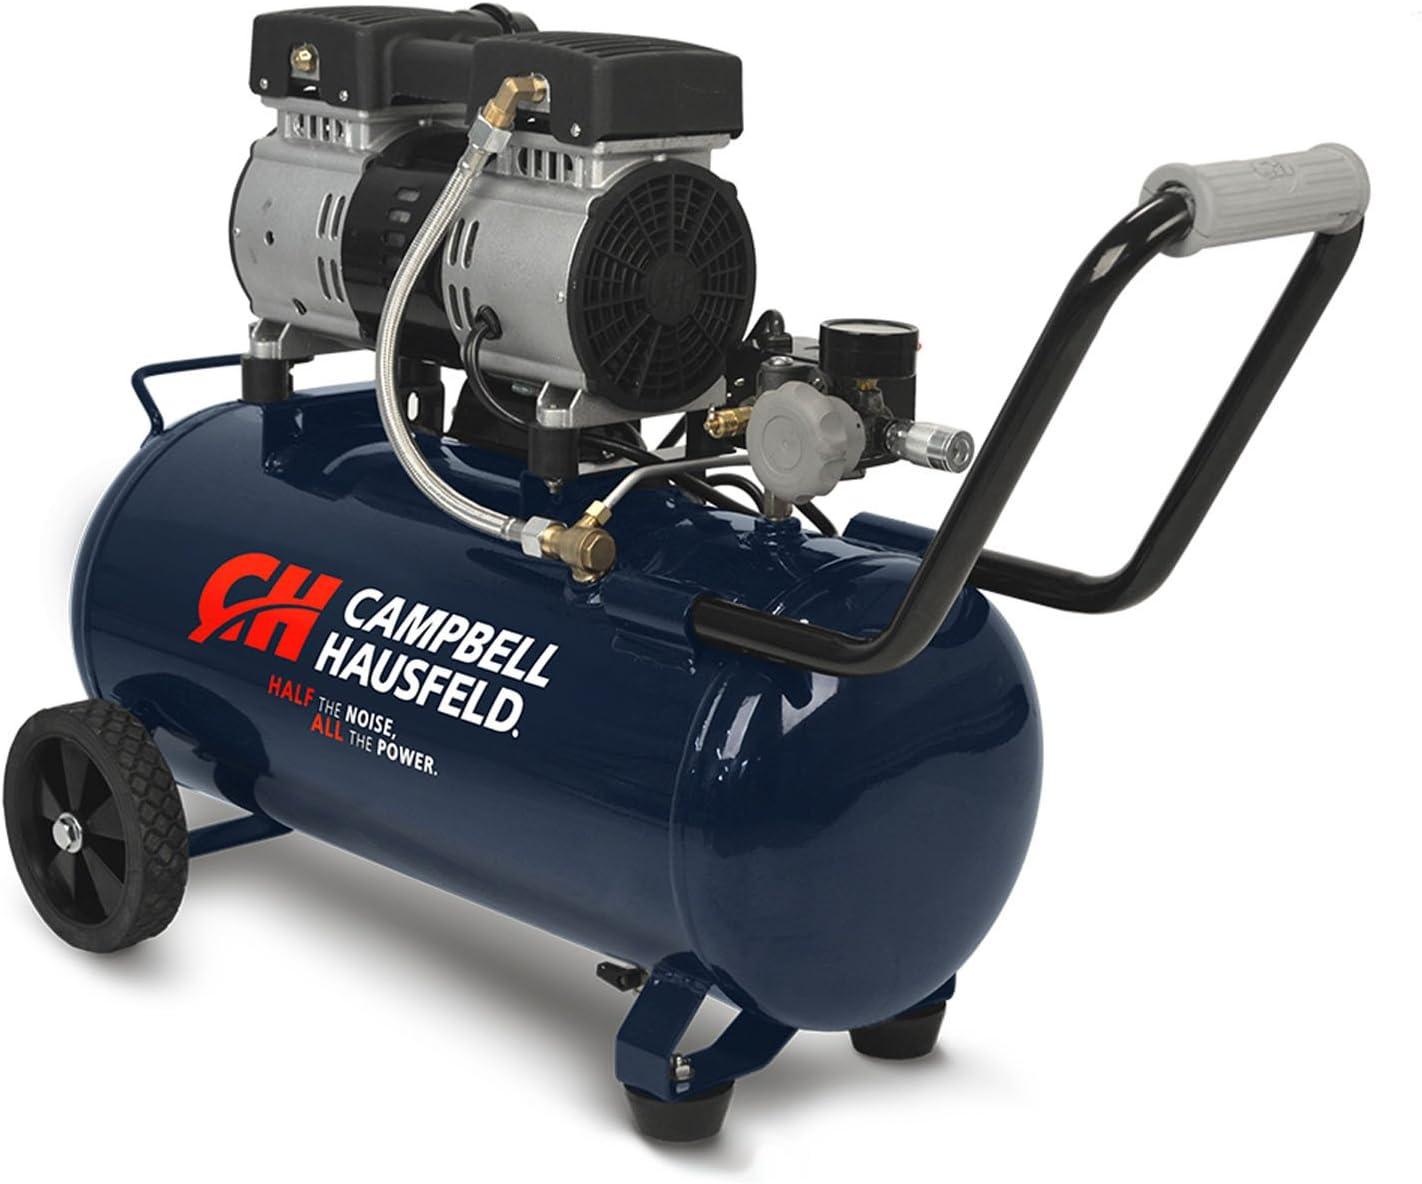 Campbell Hausfeld DC080500 Air Compressor: Best Pick for 8-Gallon